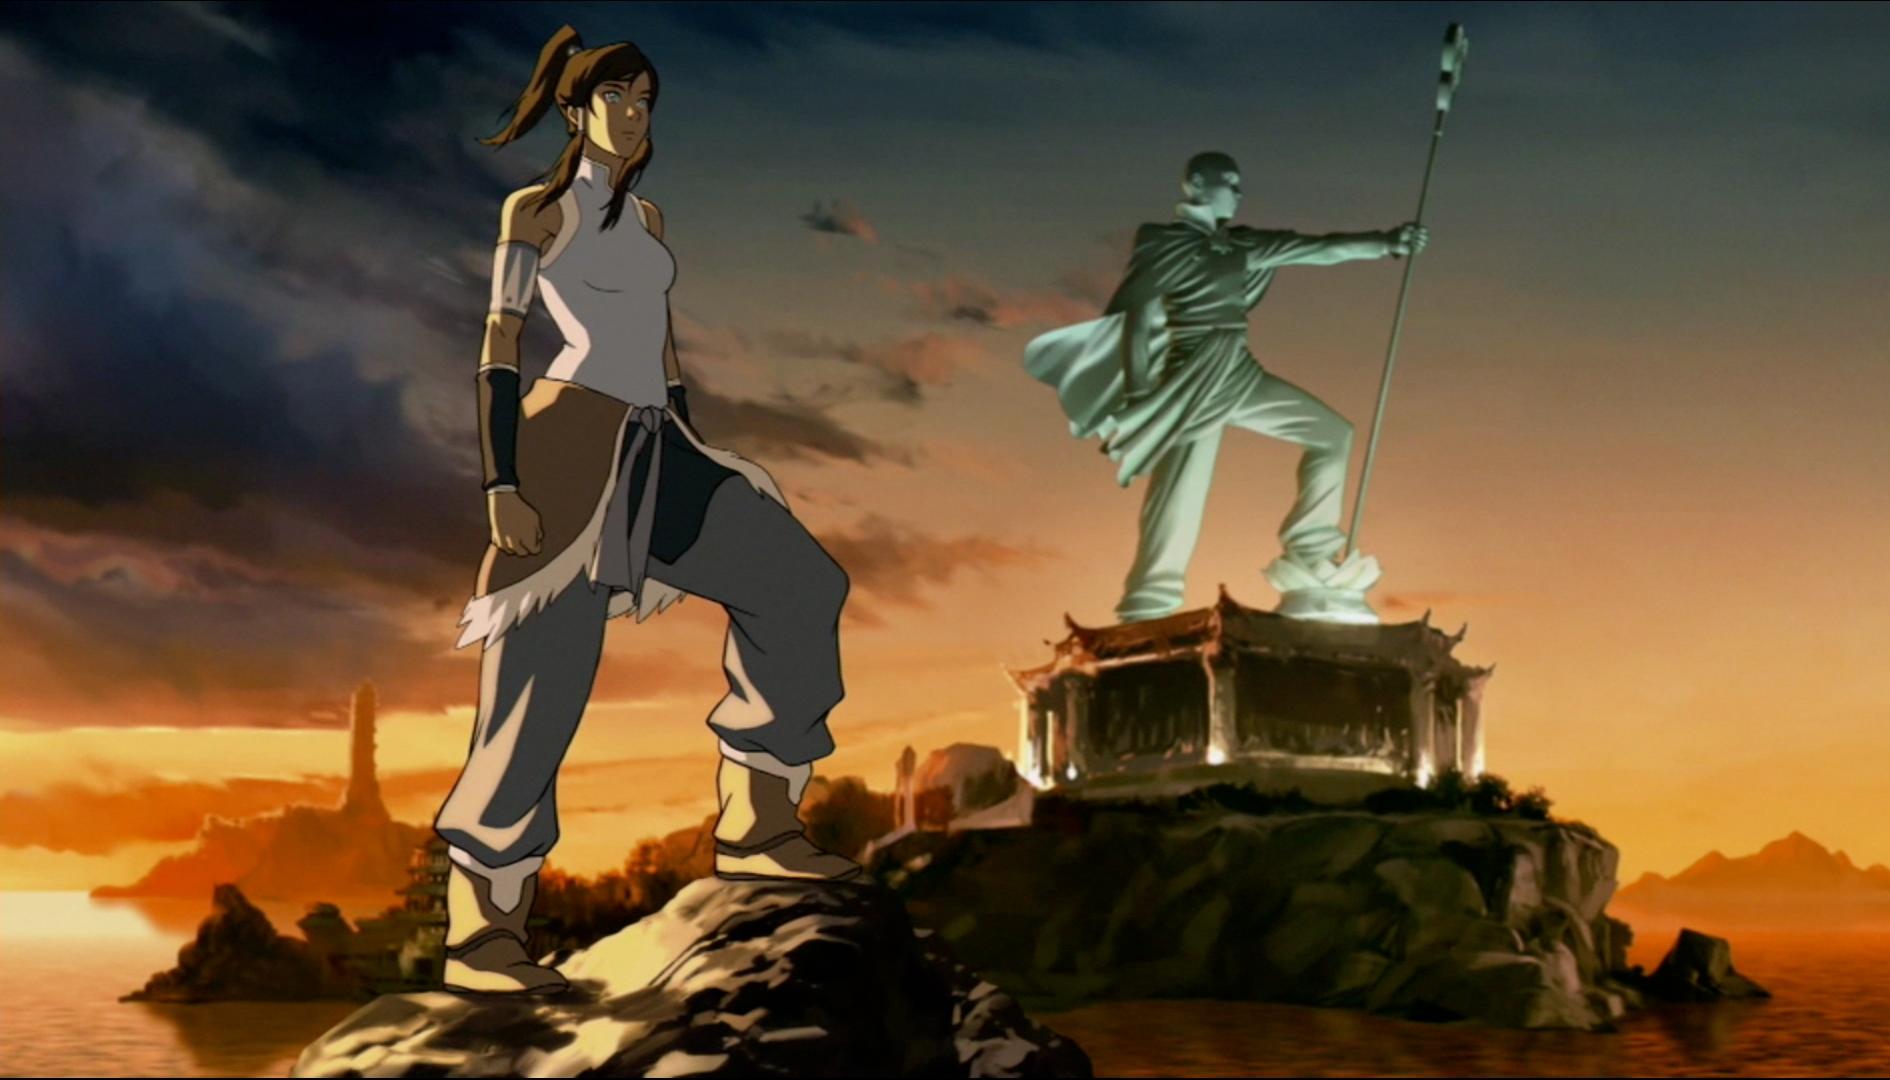 Legend Of Korra 23 Widescreen Wallpaper